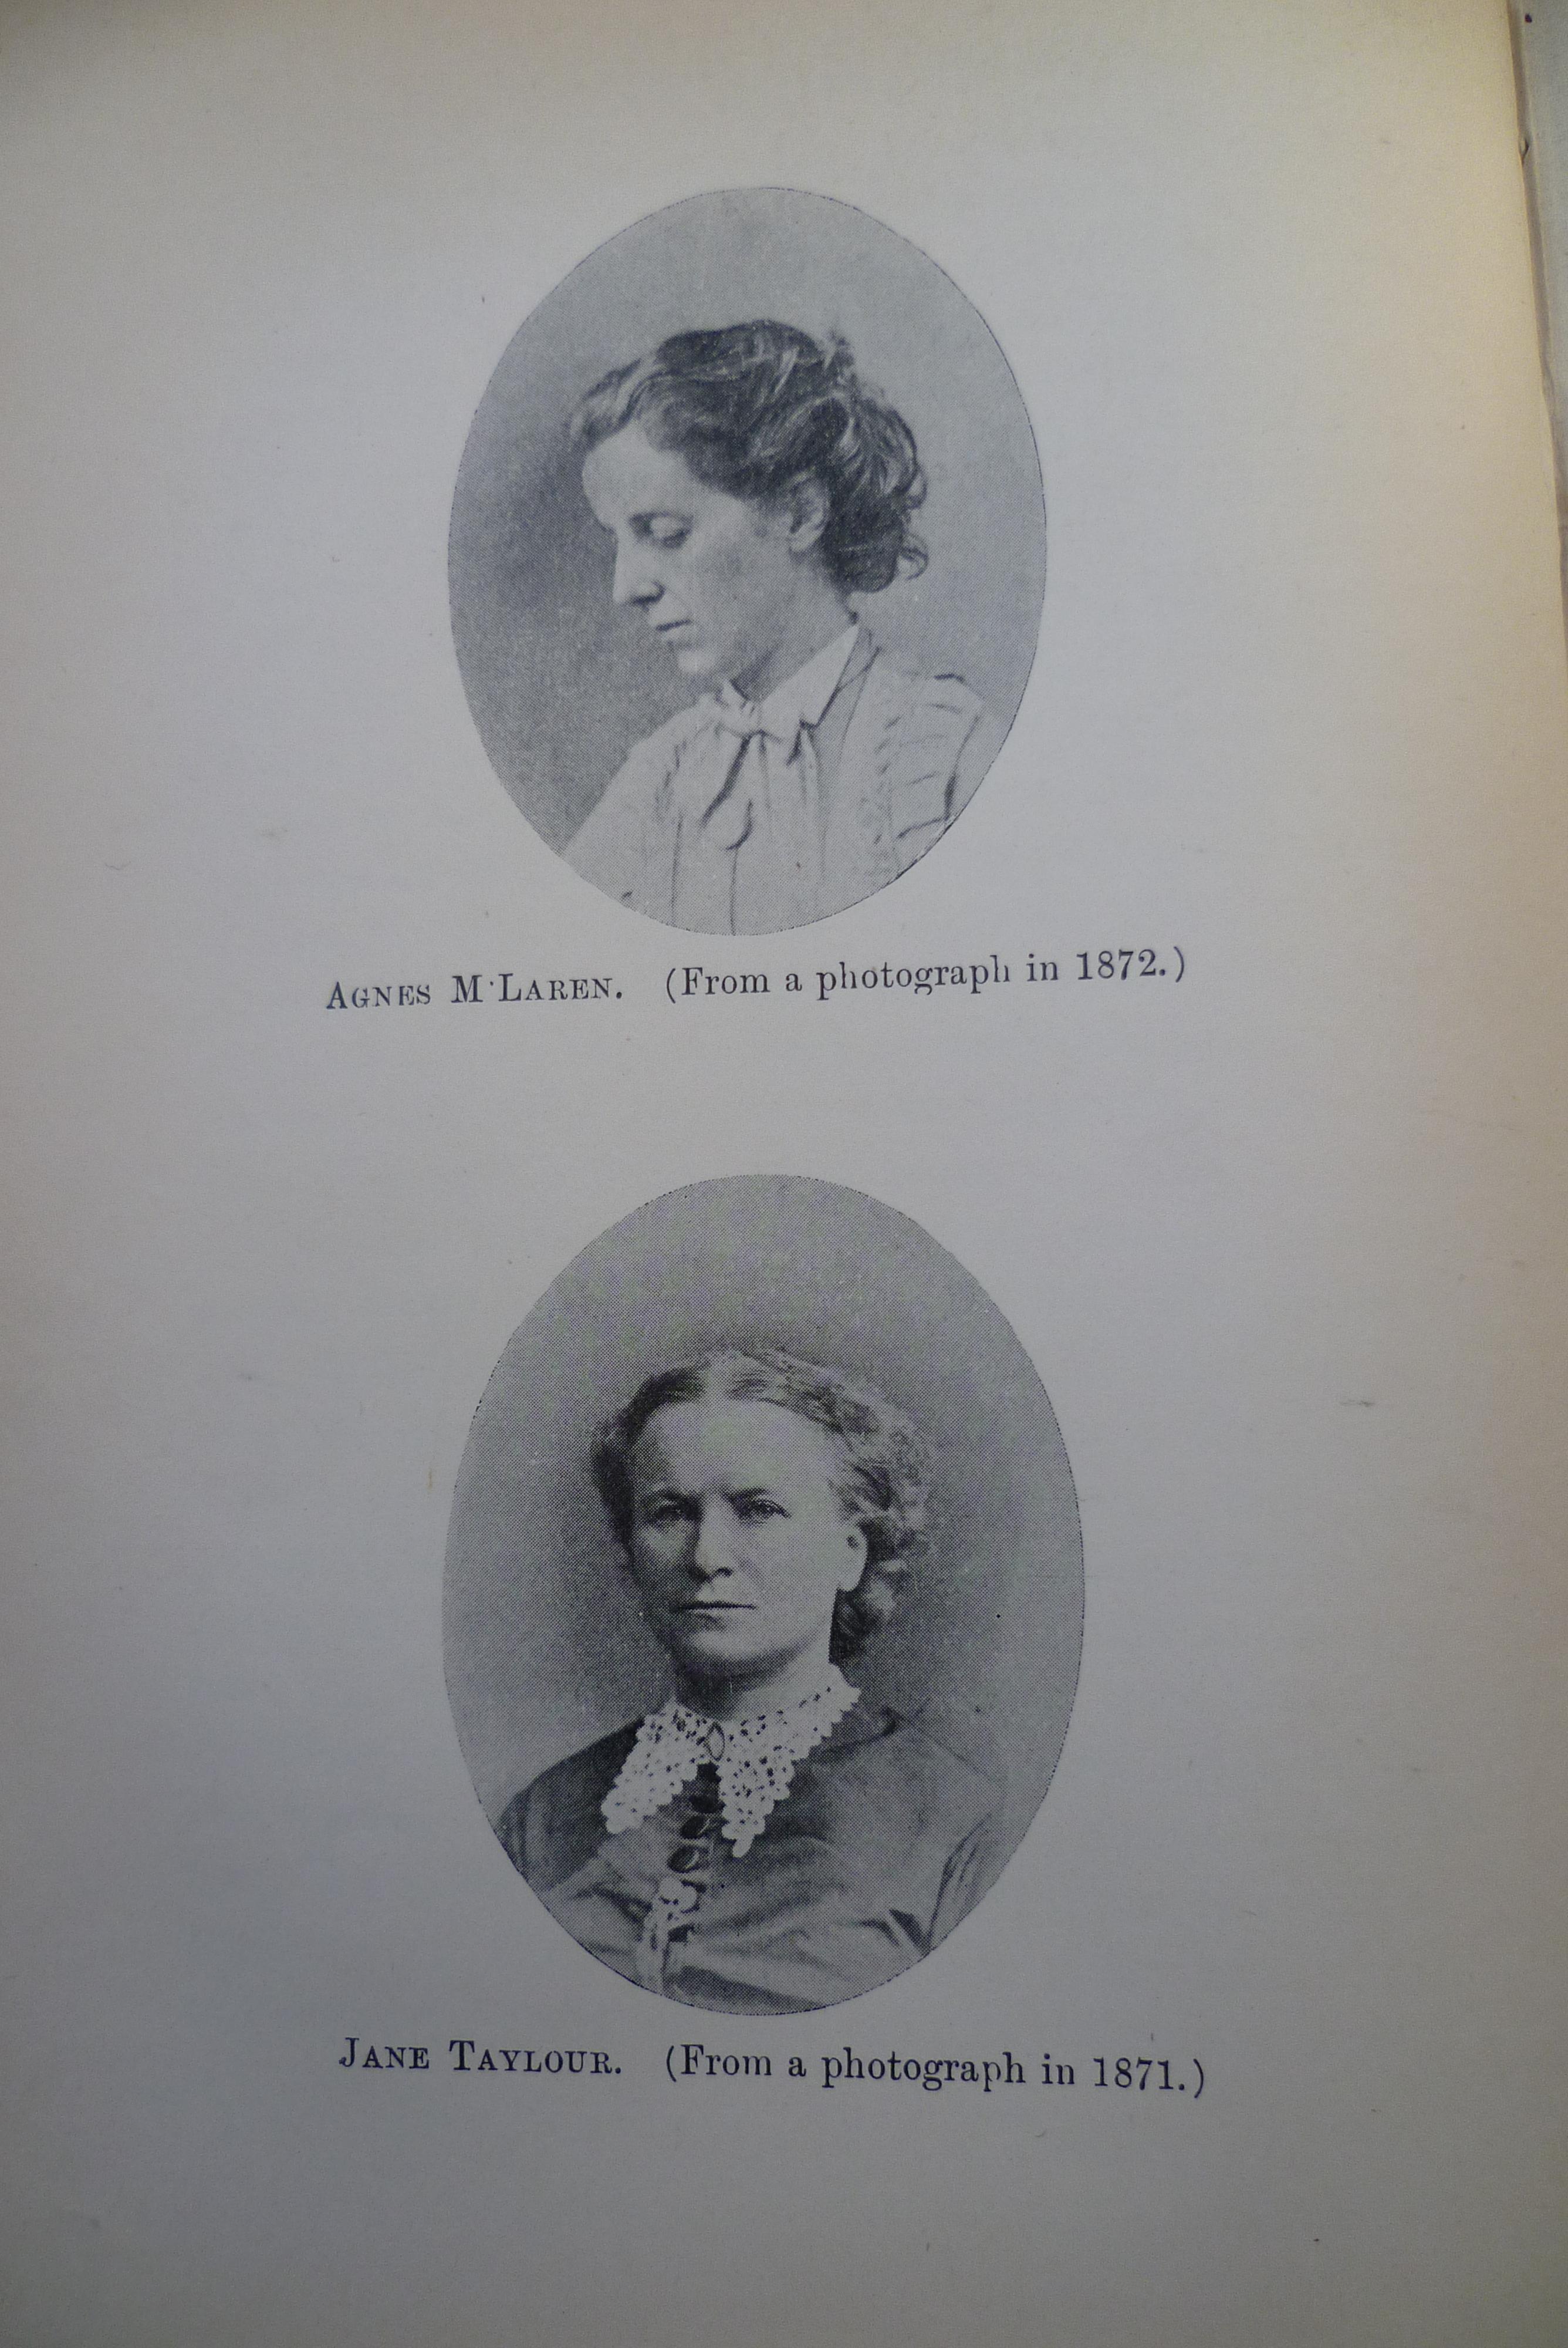 Agnes McLaren and Jane Taylour